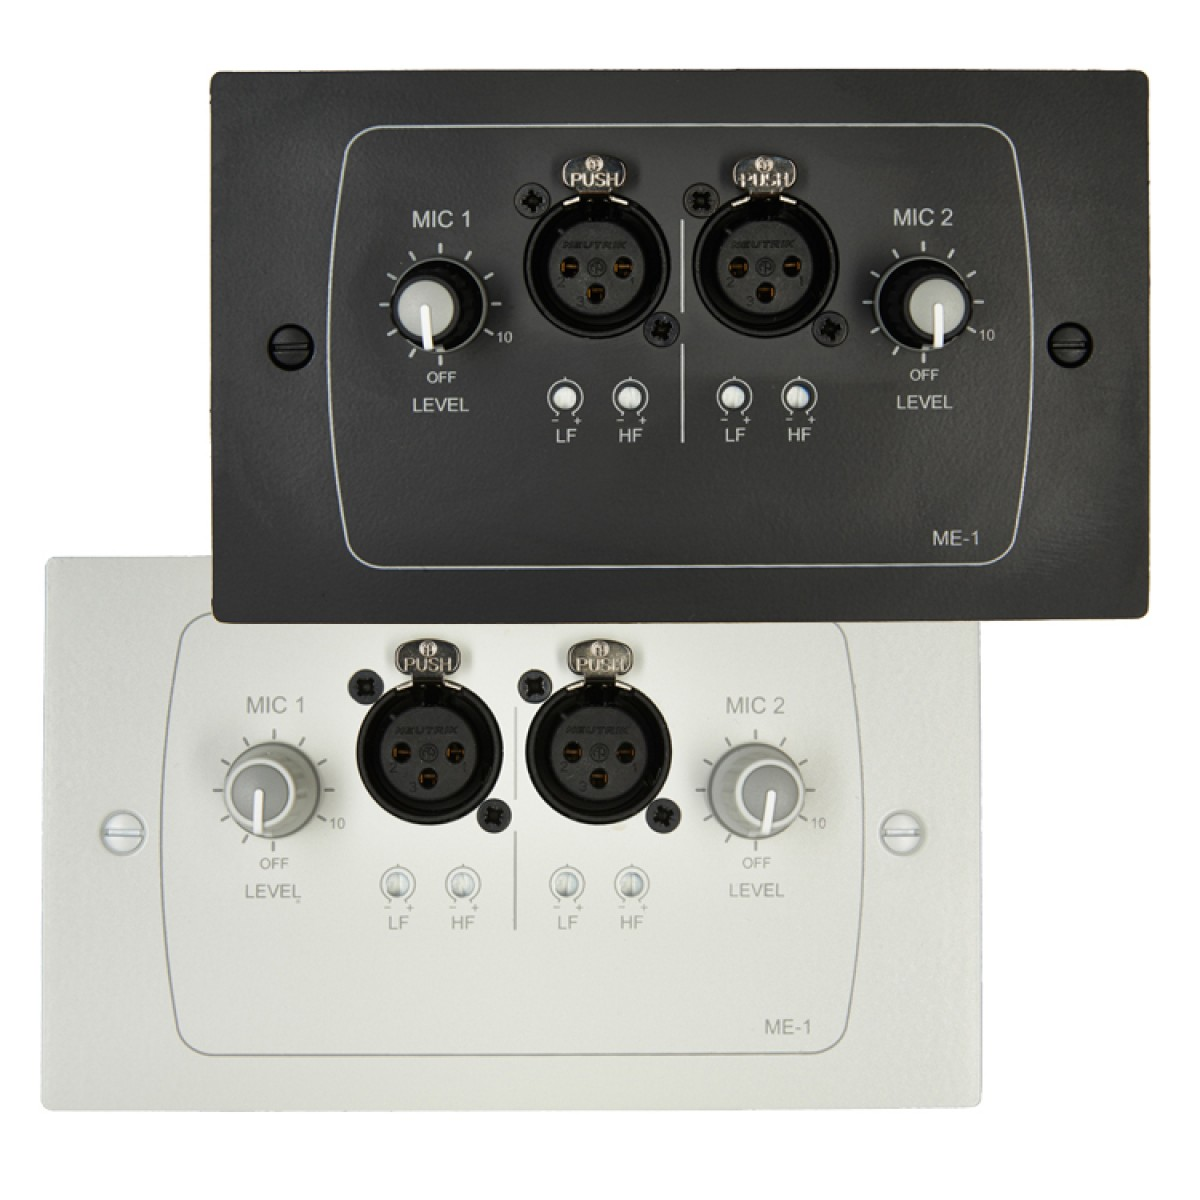 ME-1W &ME-1B Microphone Input Module for DCM-1 / DCM-1e